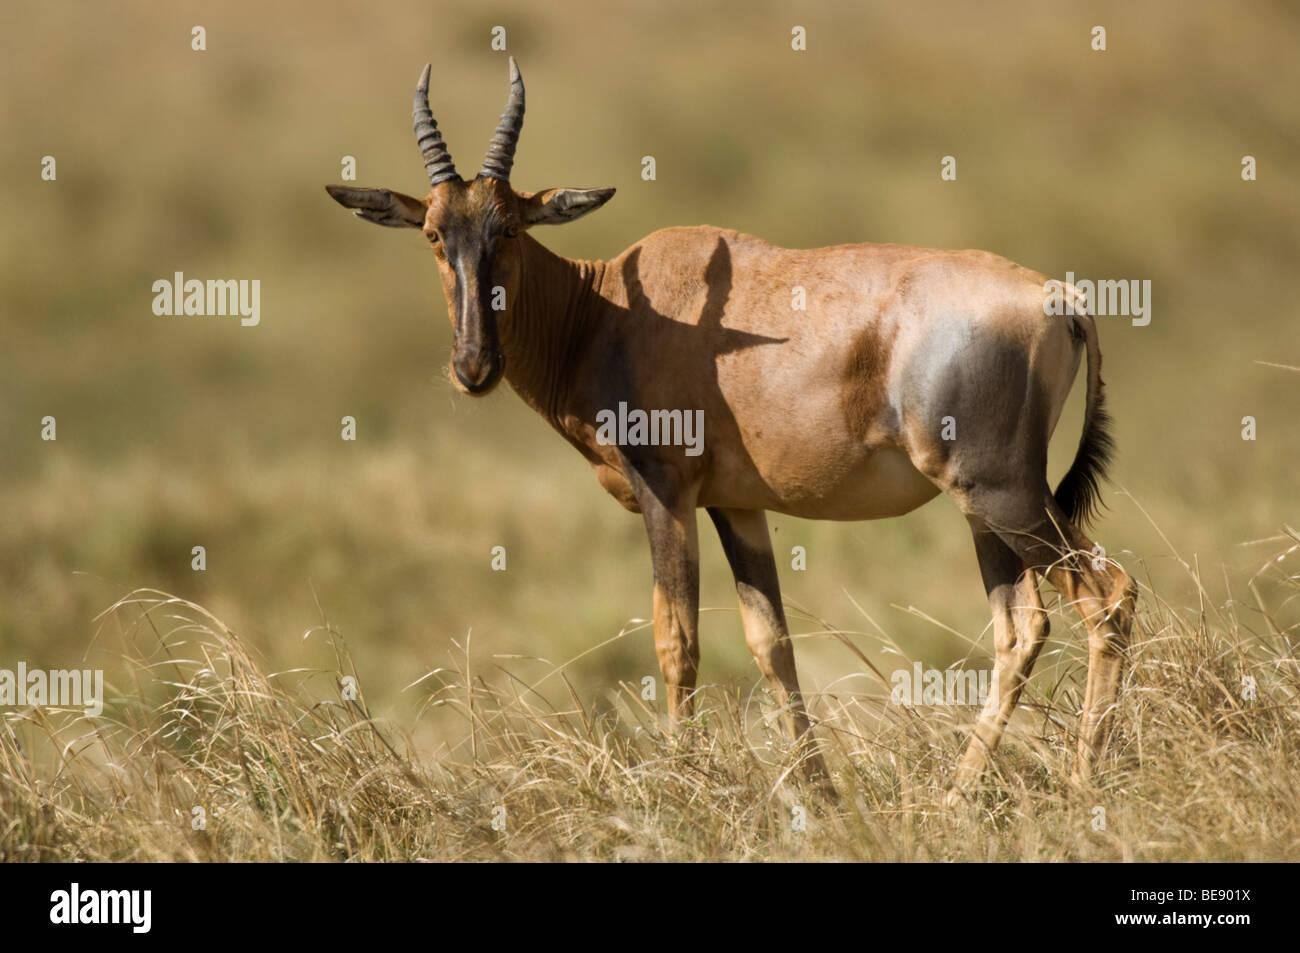 Topi (Damaliscus lunatus jimela), Maasai Mara National Reserve, Kenya - Stock Image